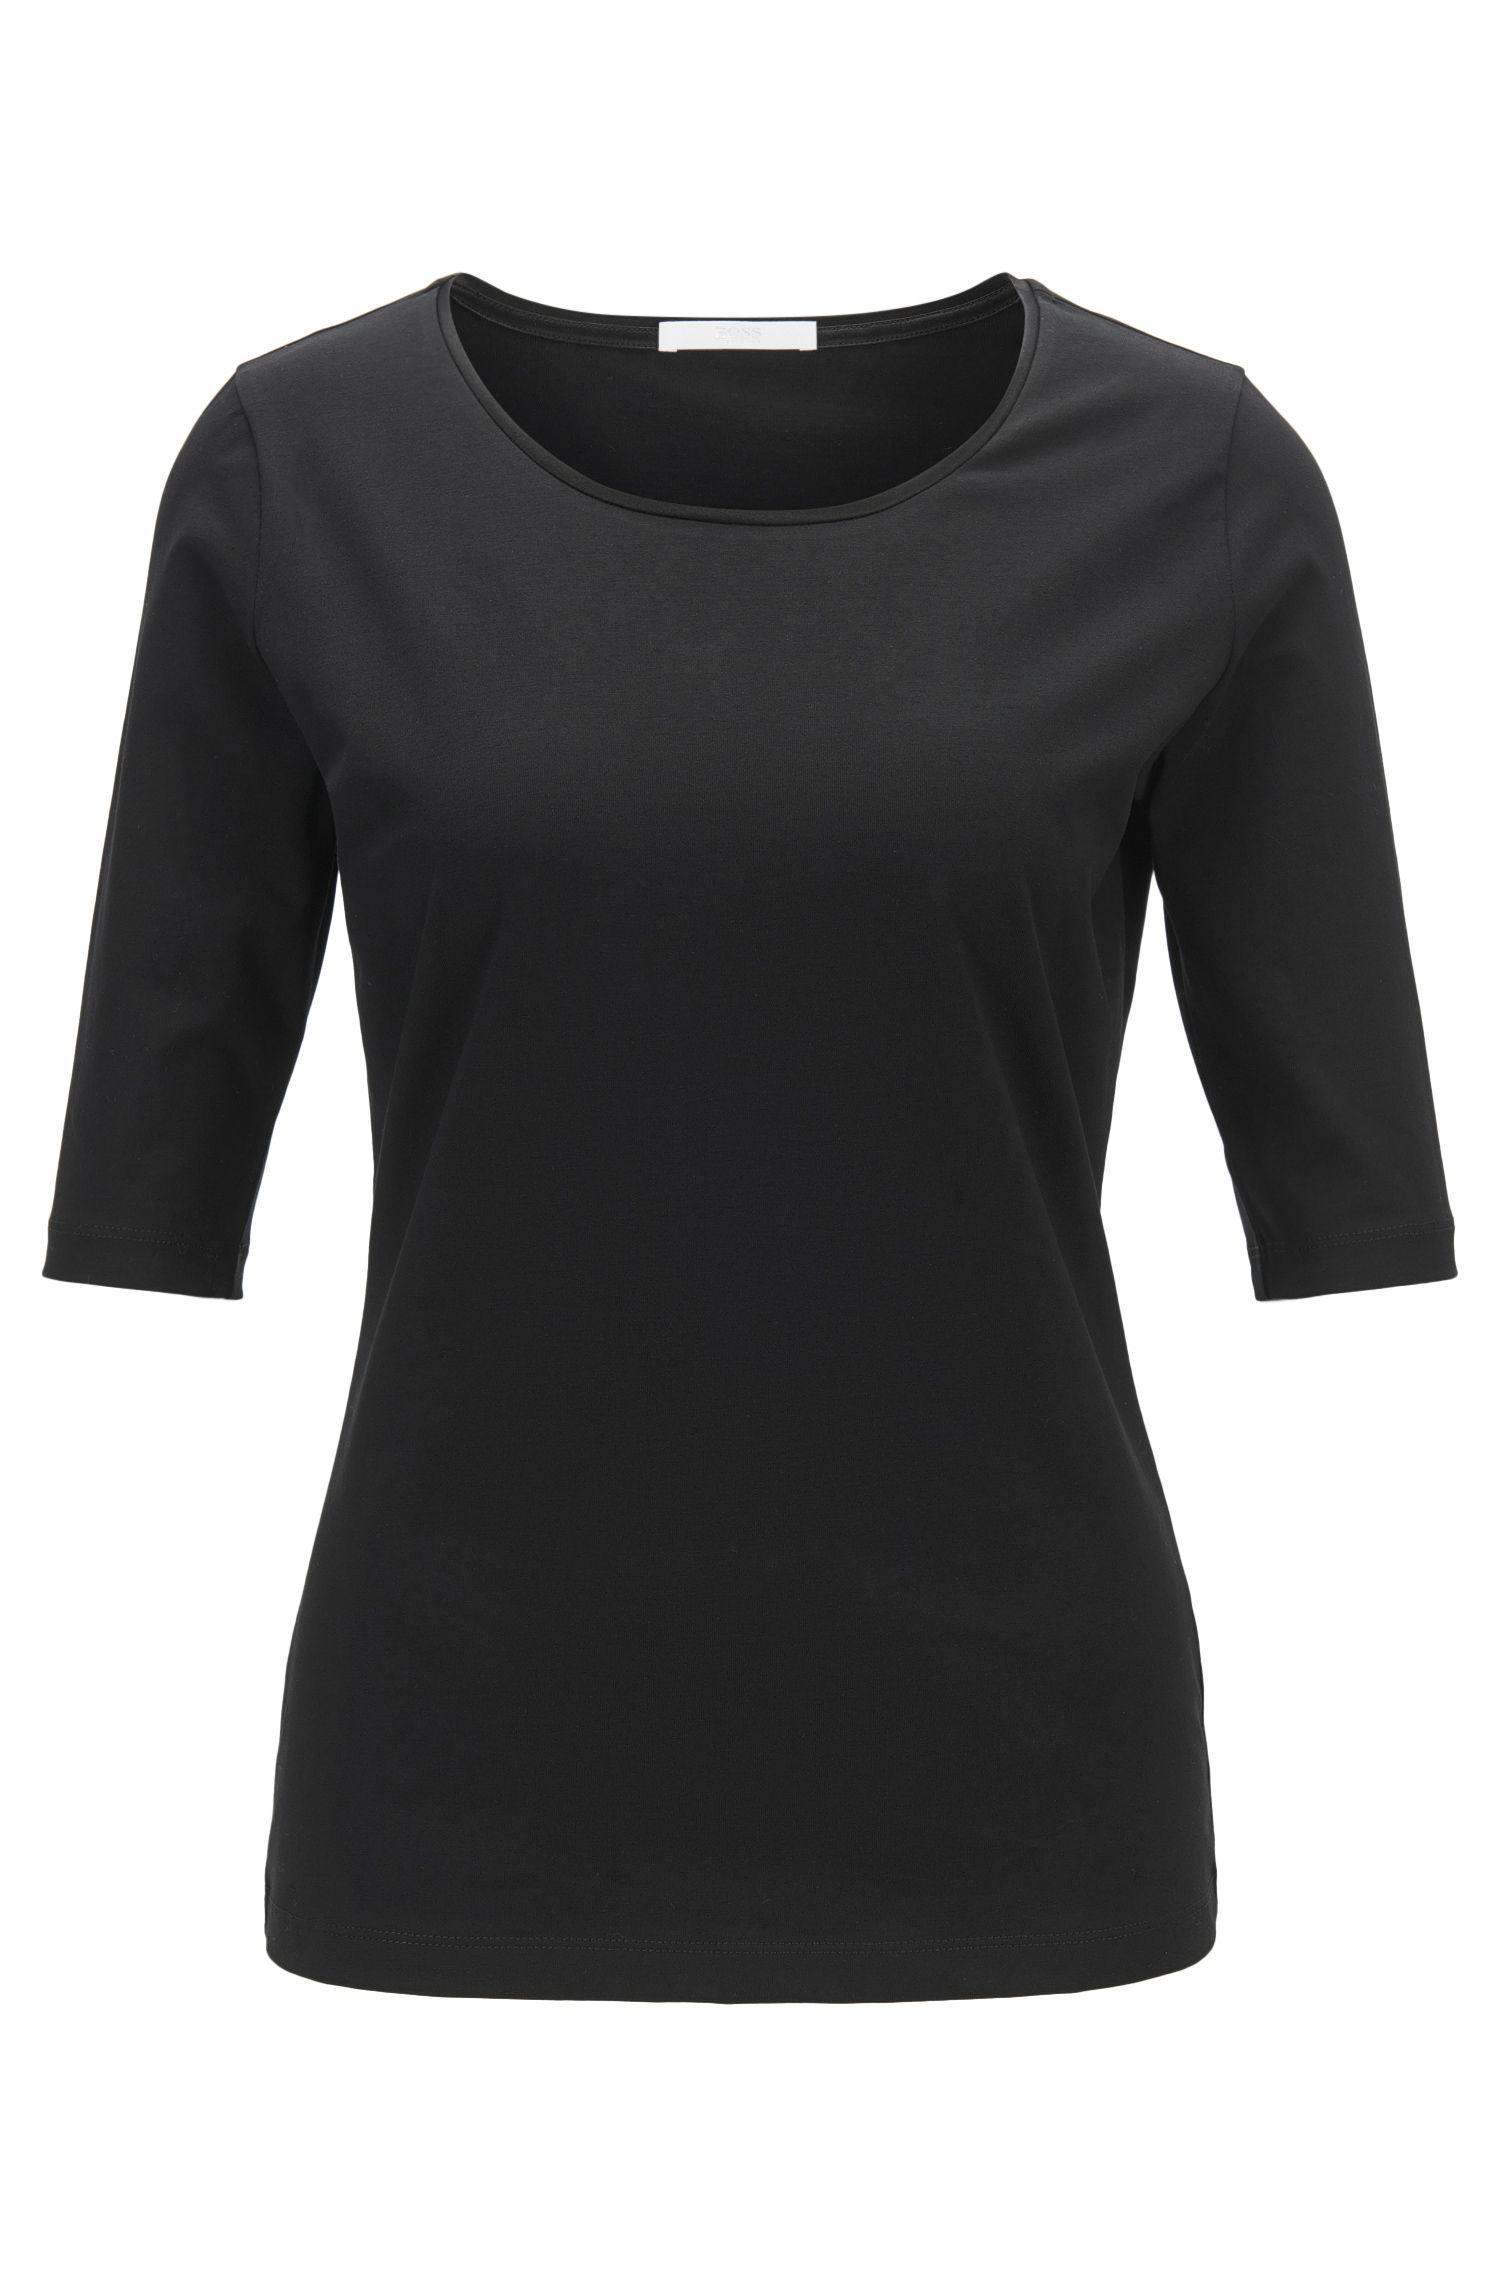 'Emmsi' | Stretch Cotton Jersey Blouse